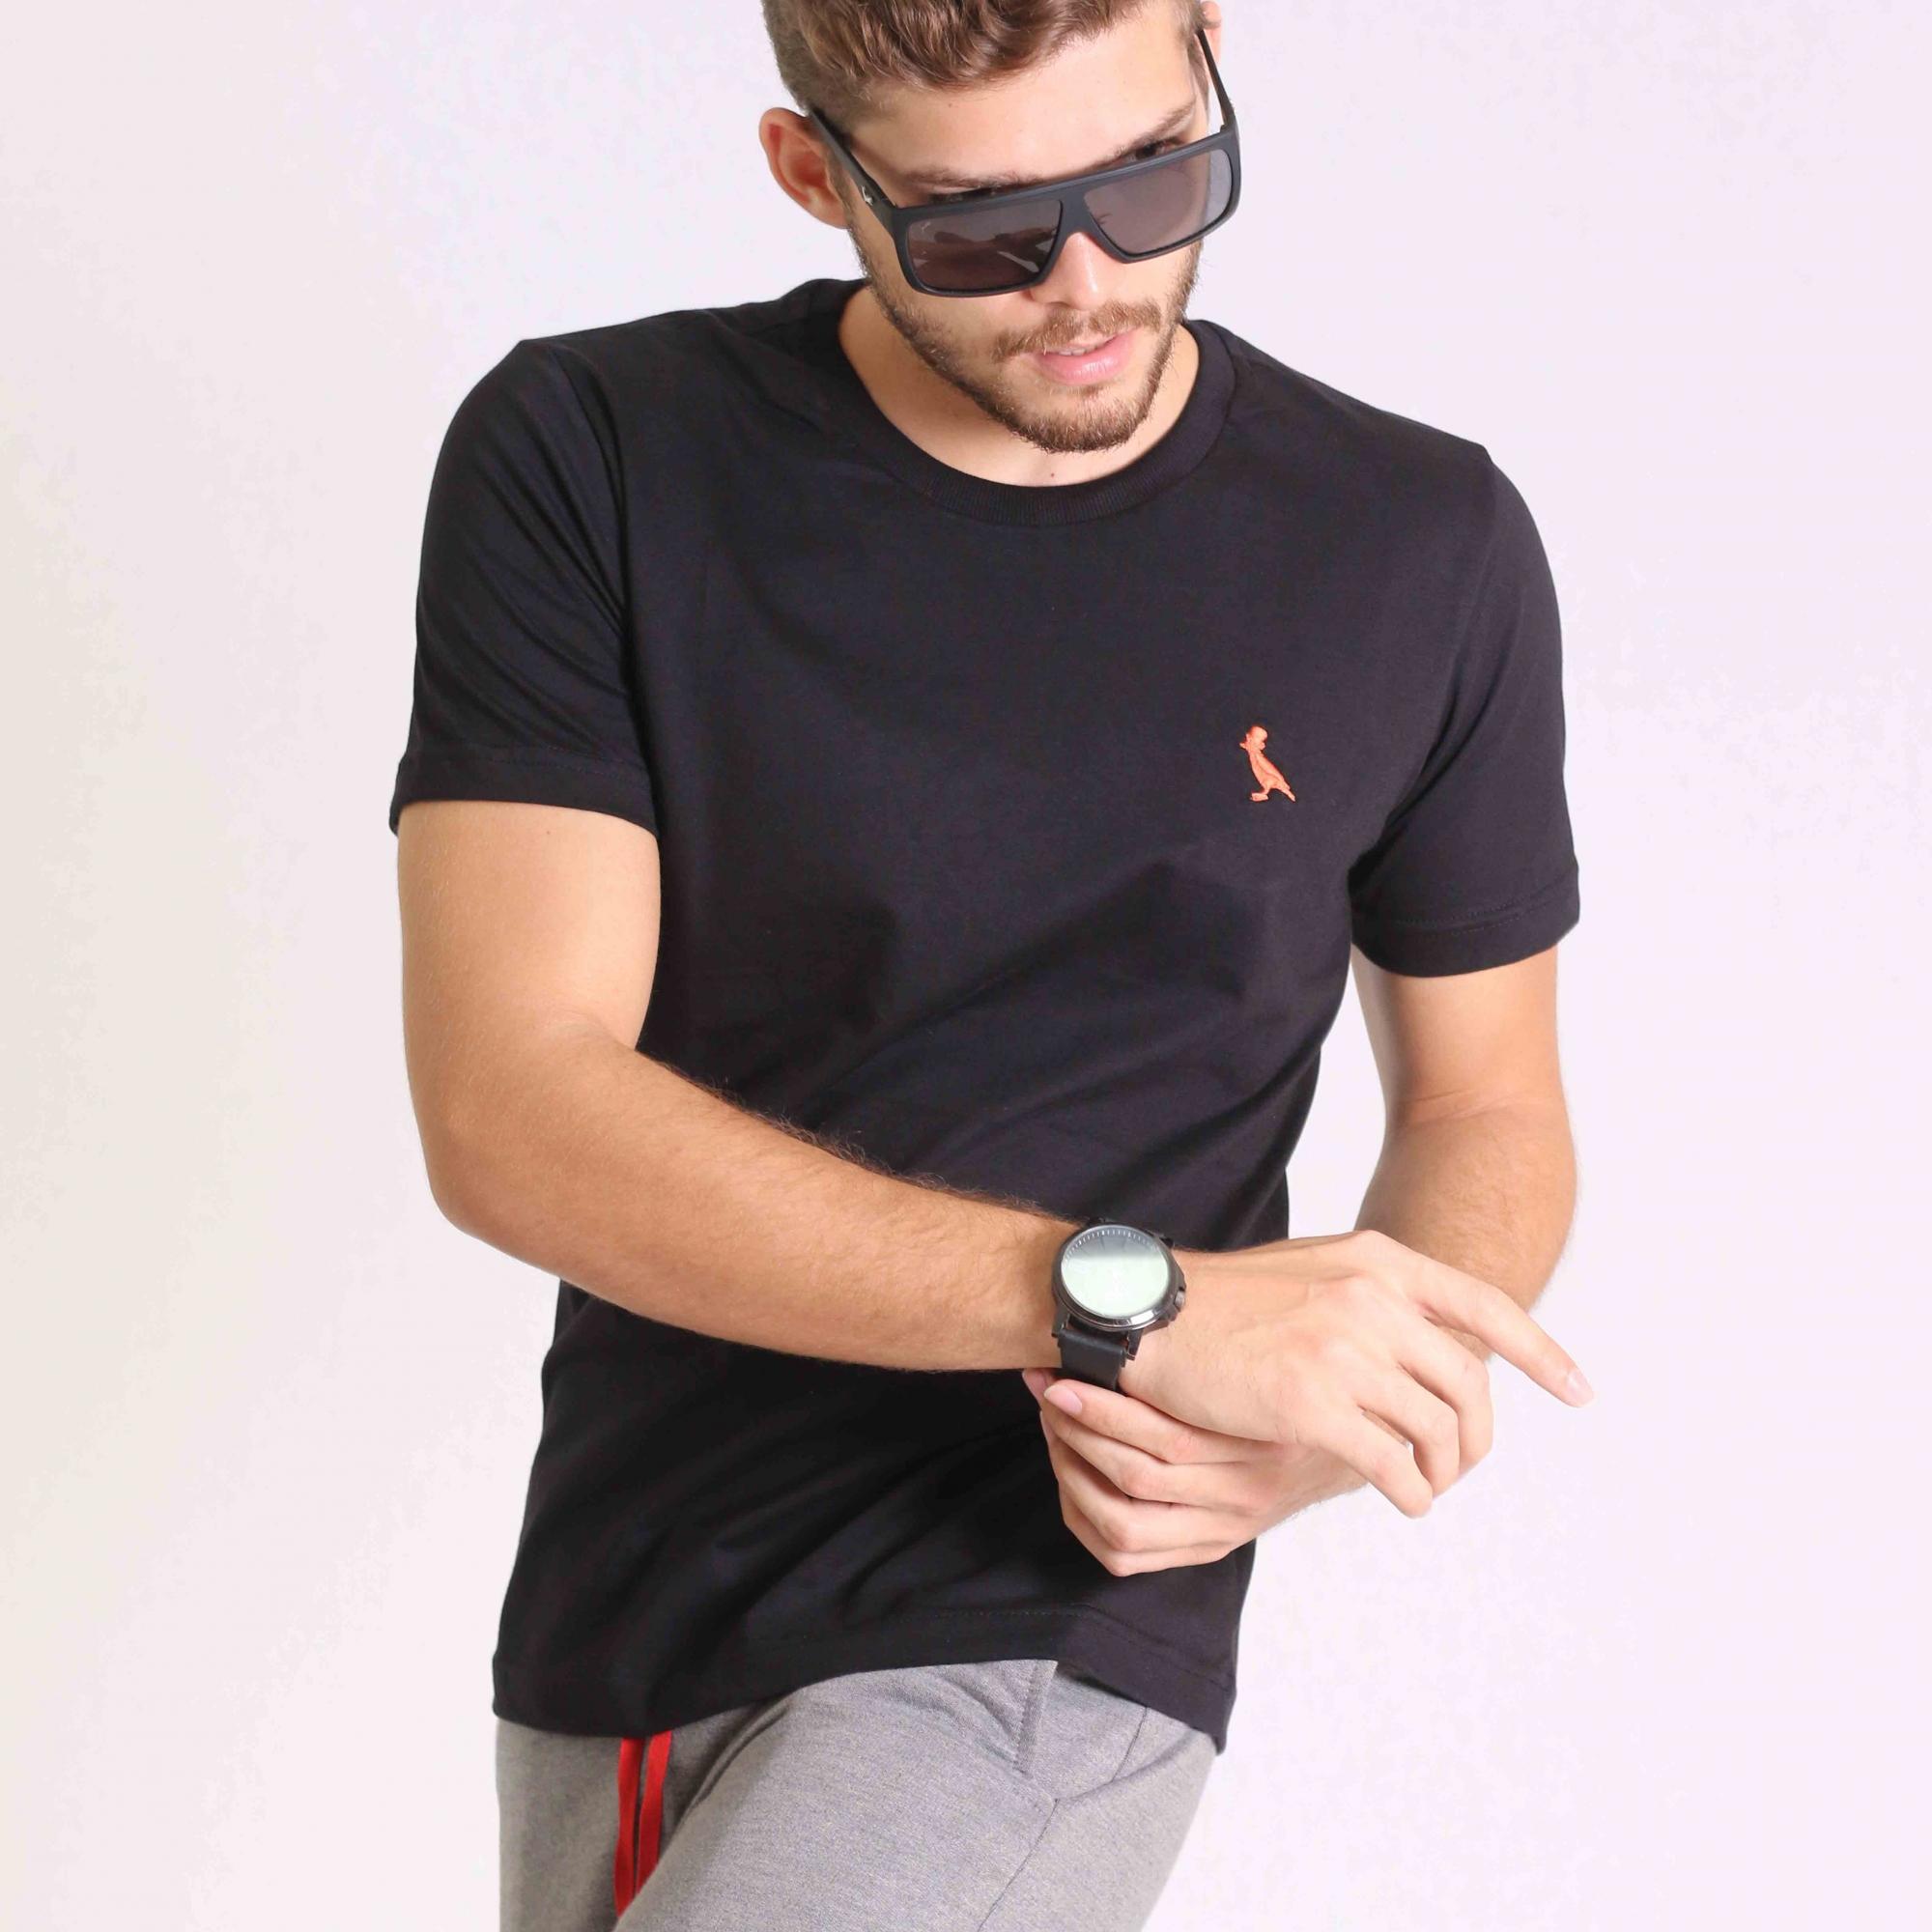 kit 3 Camisetas Básica Masculino Kactoos   - Kactoos